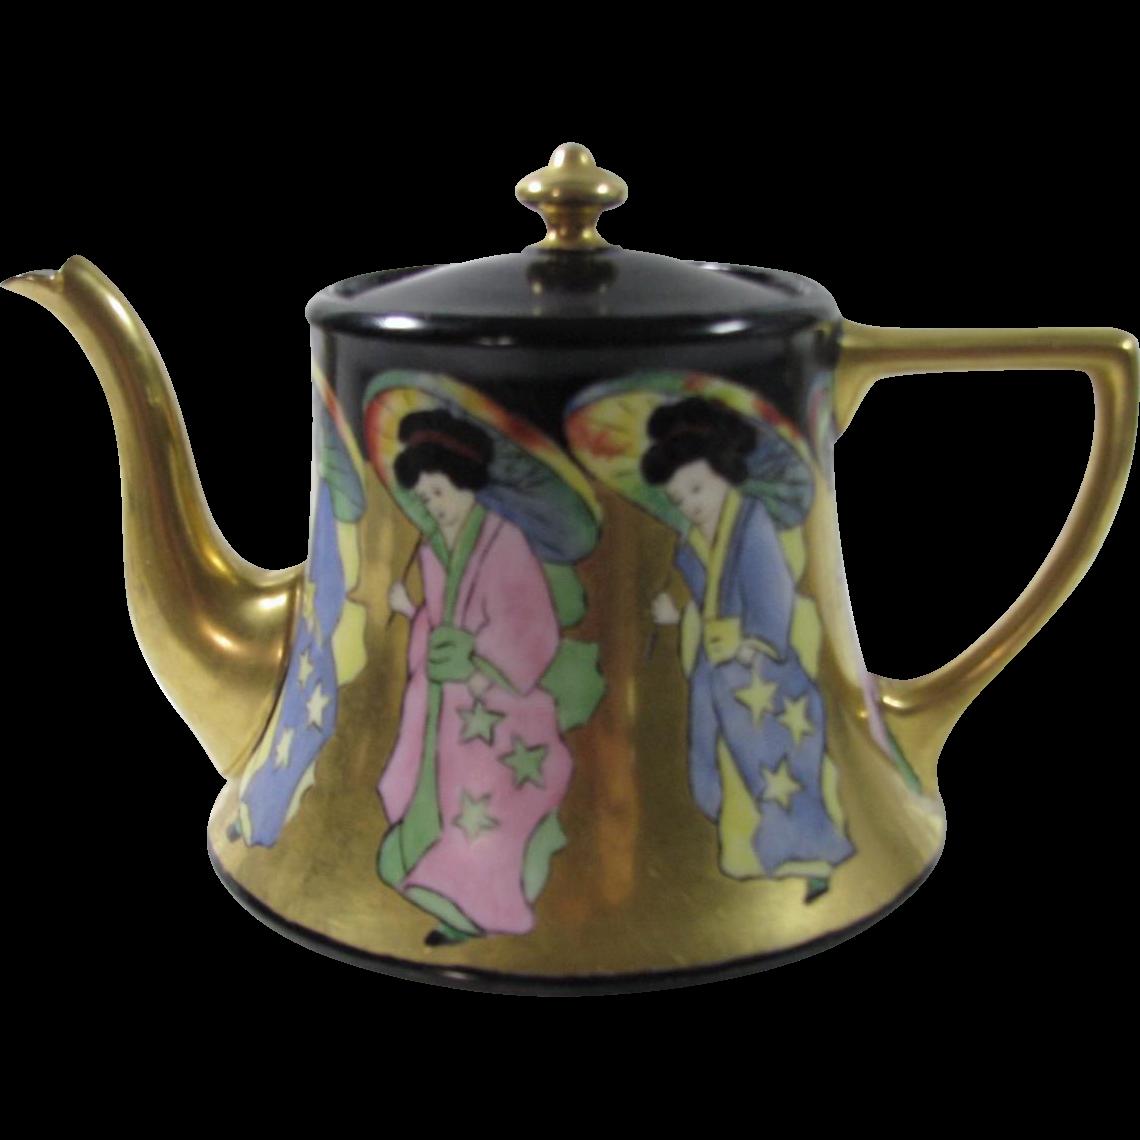 William Guerin & Co. Limoges Metallic Design Teapot.